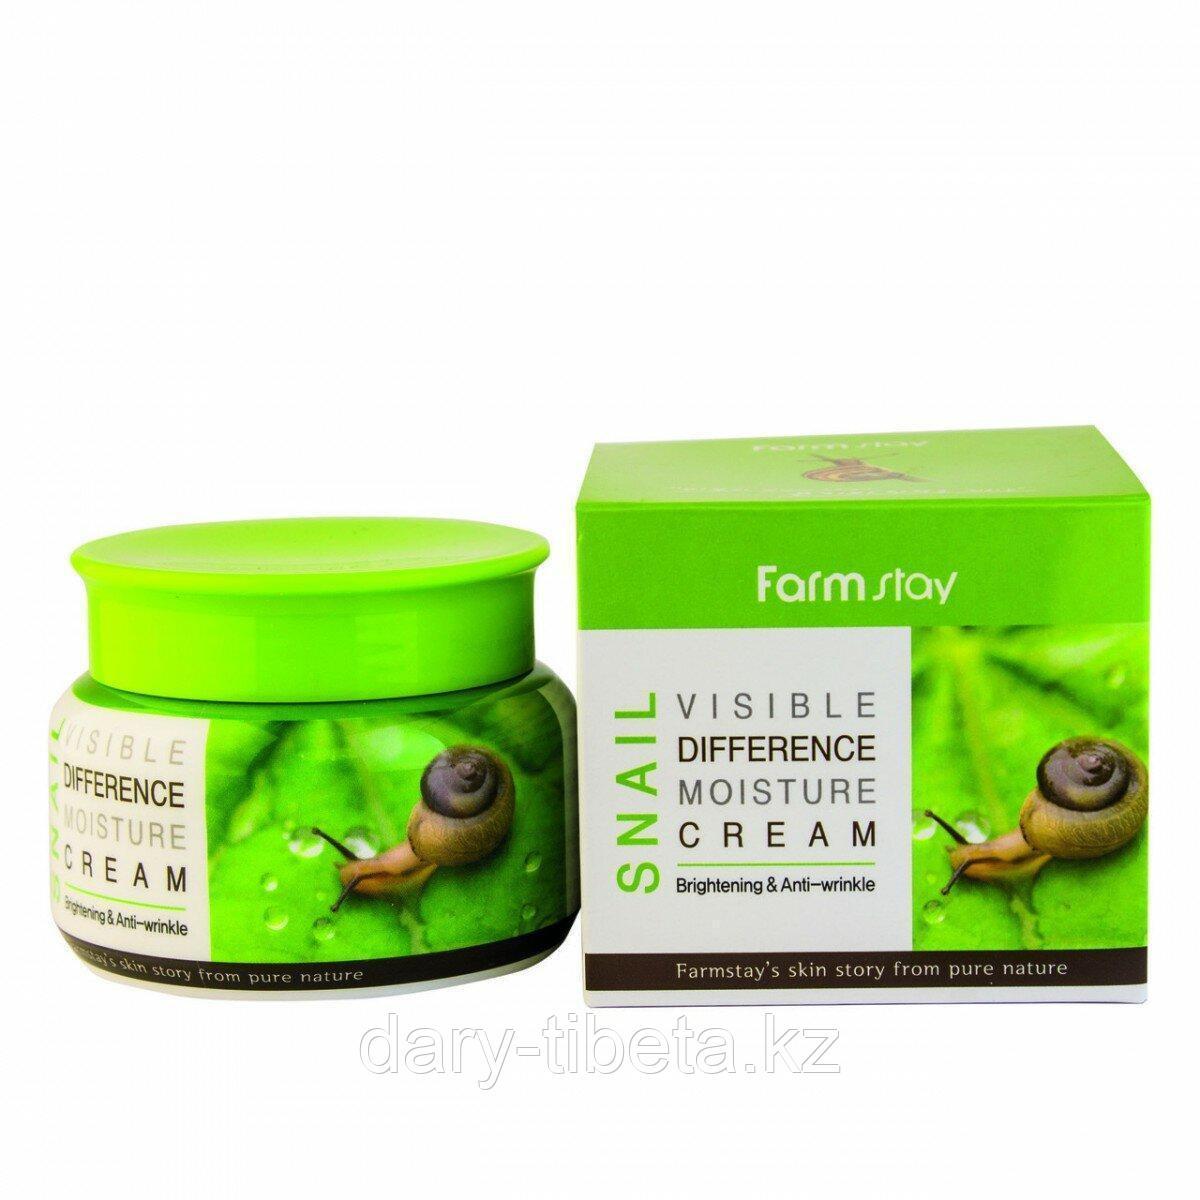 Farm Stay Visible Difference Moisture cream Snail - Крем для лица с муцином улитки 100 гр.